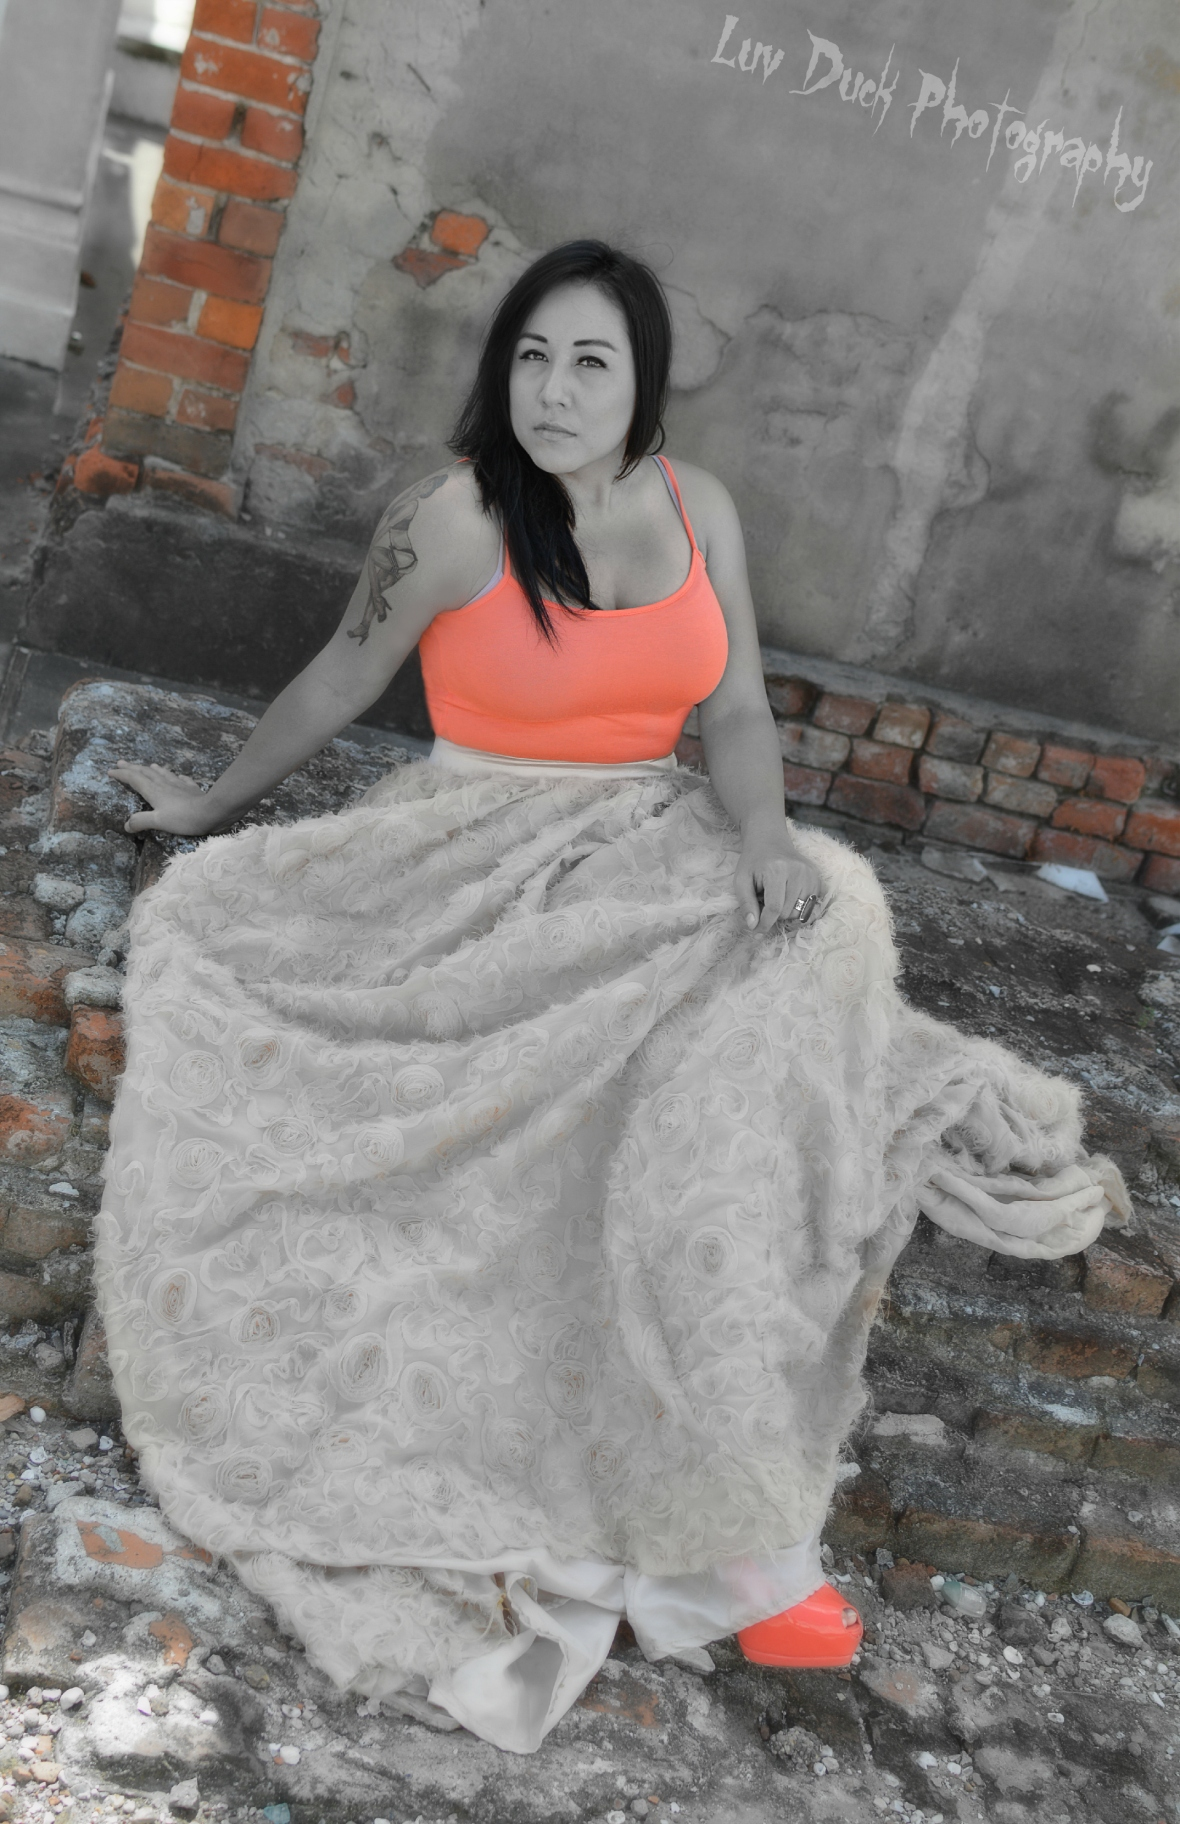 Rosario in the Graveyard